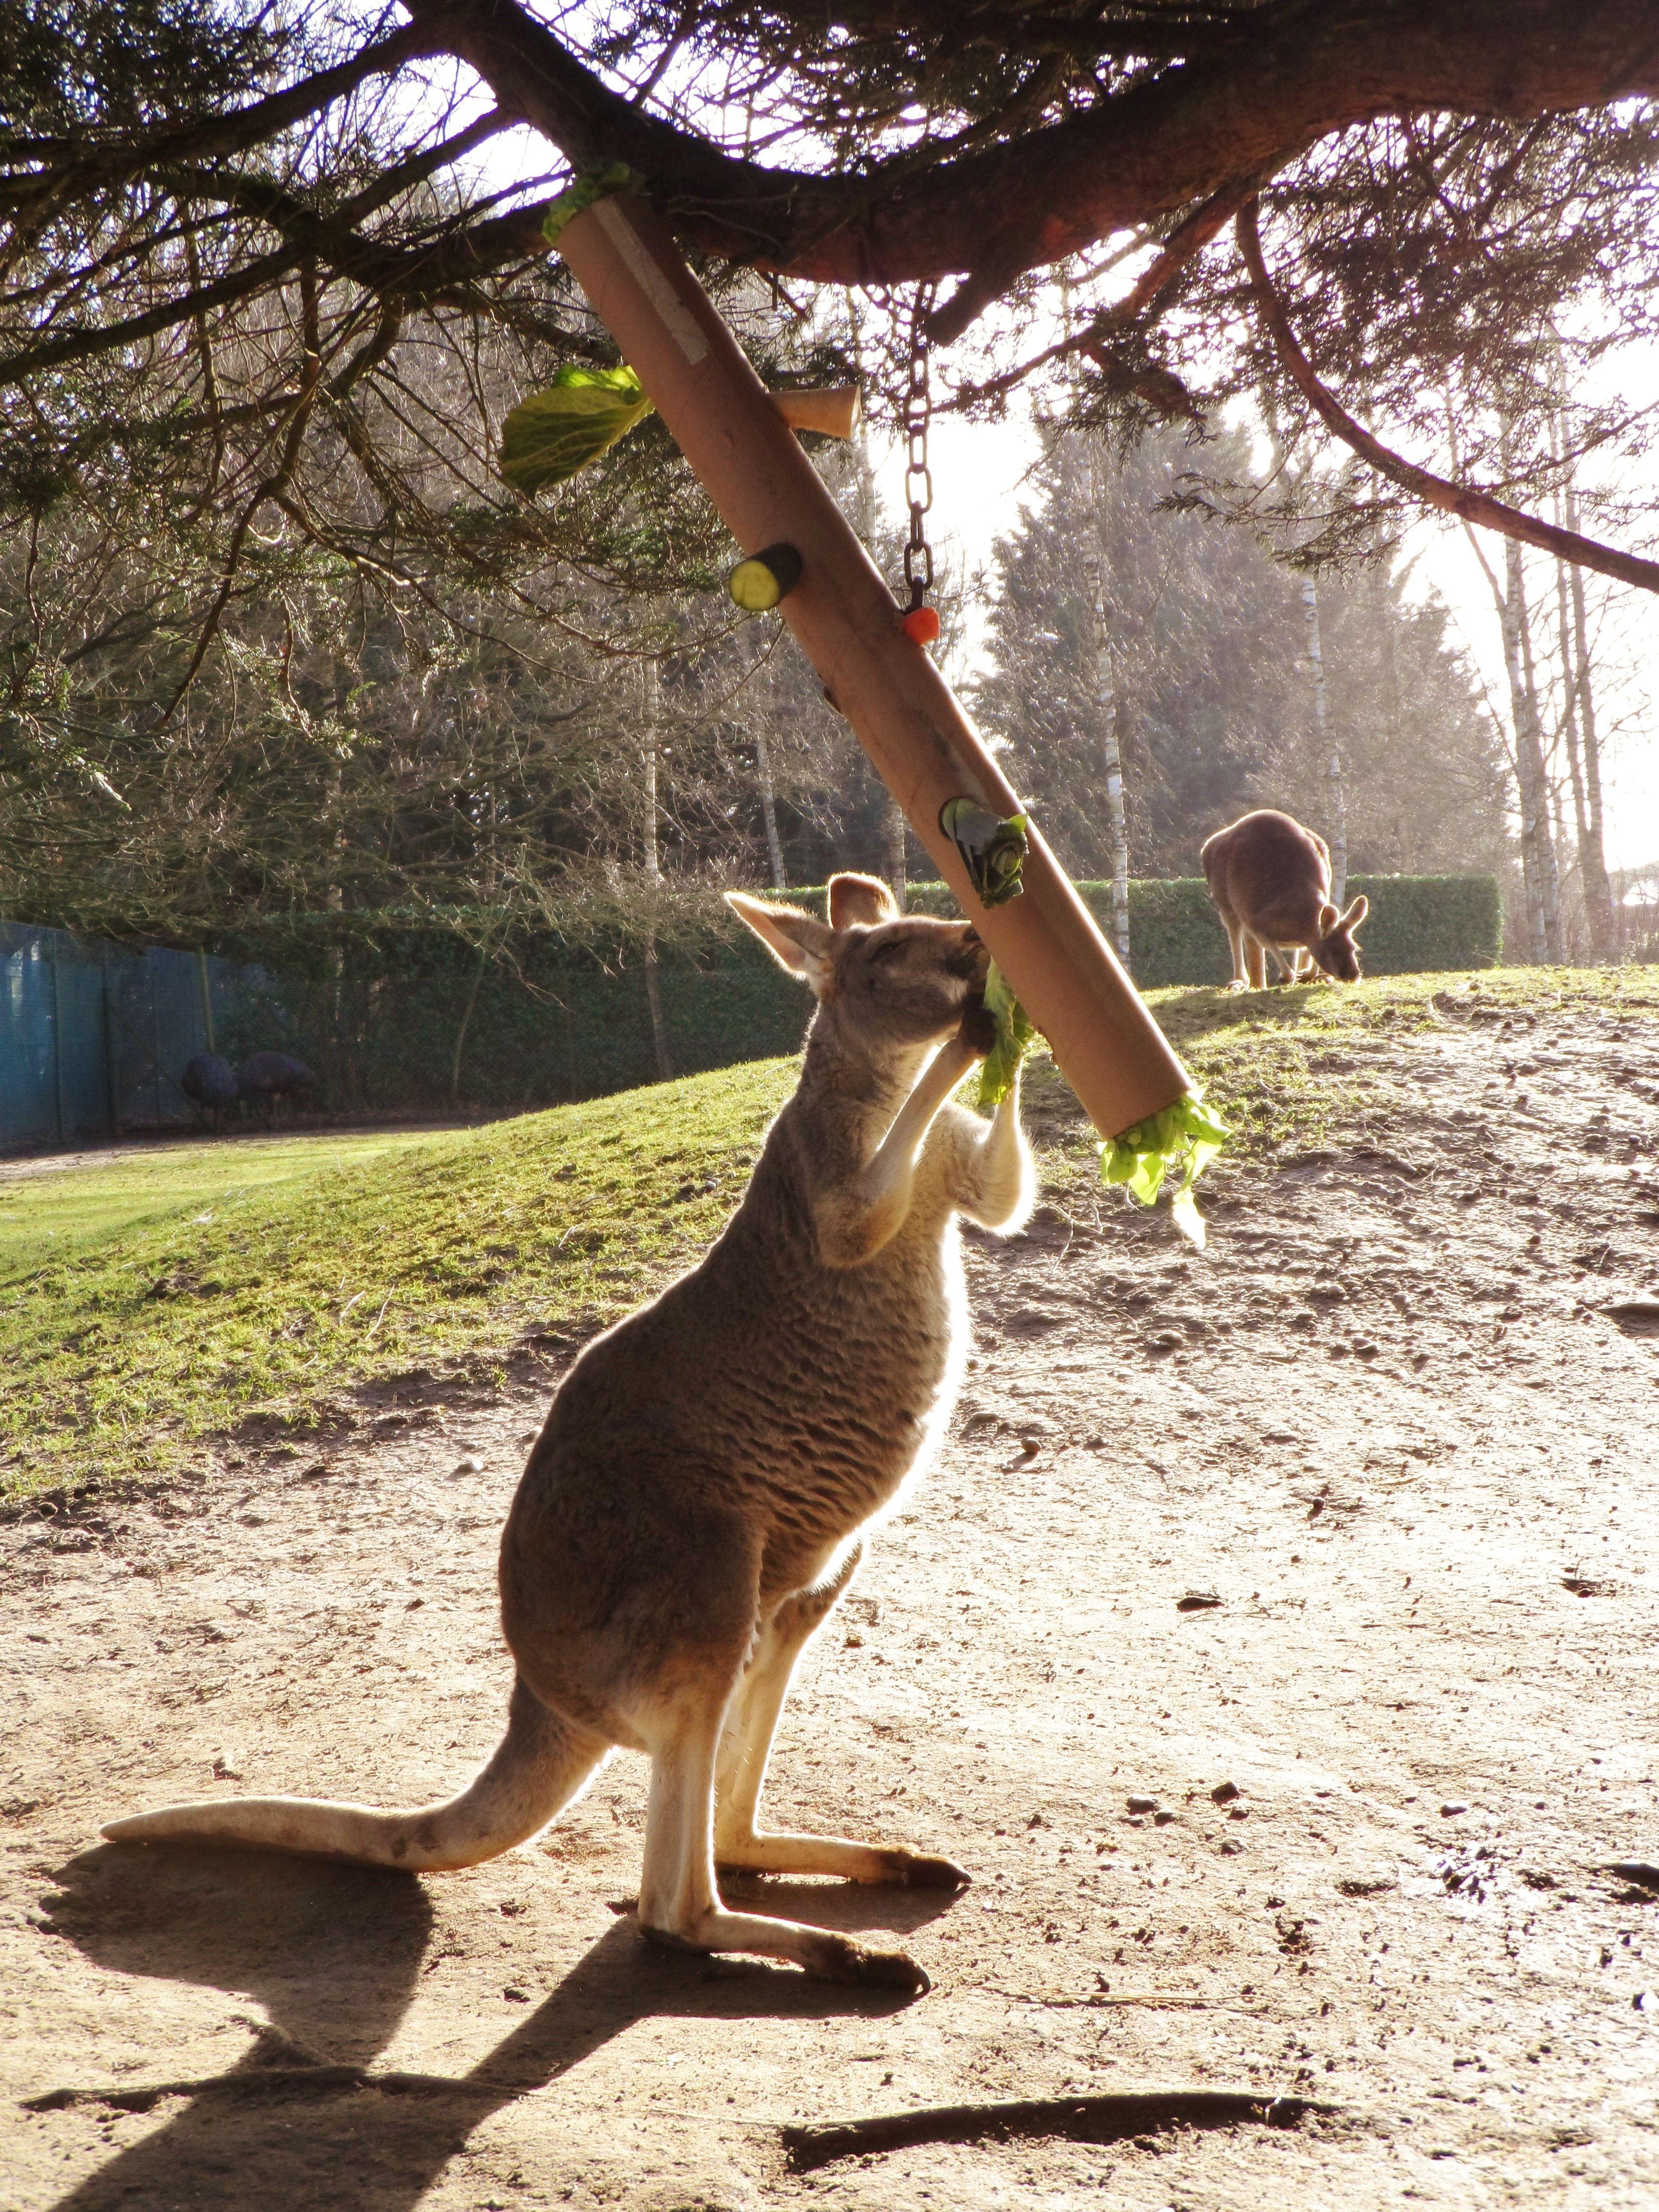 Kangaroo Macropod Enrichment Hanging Tube With Vegetables Wedged